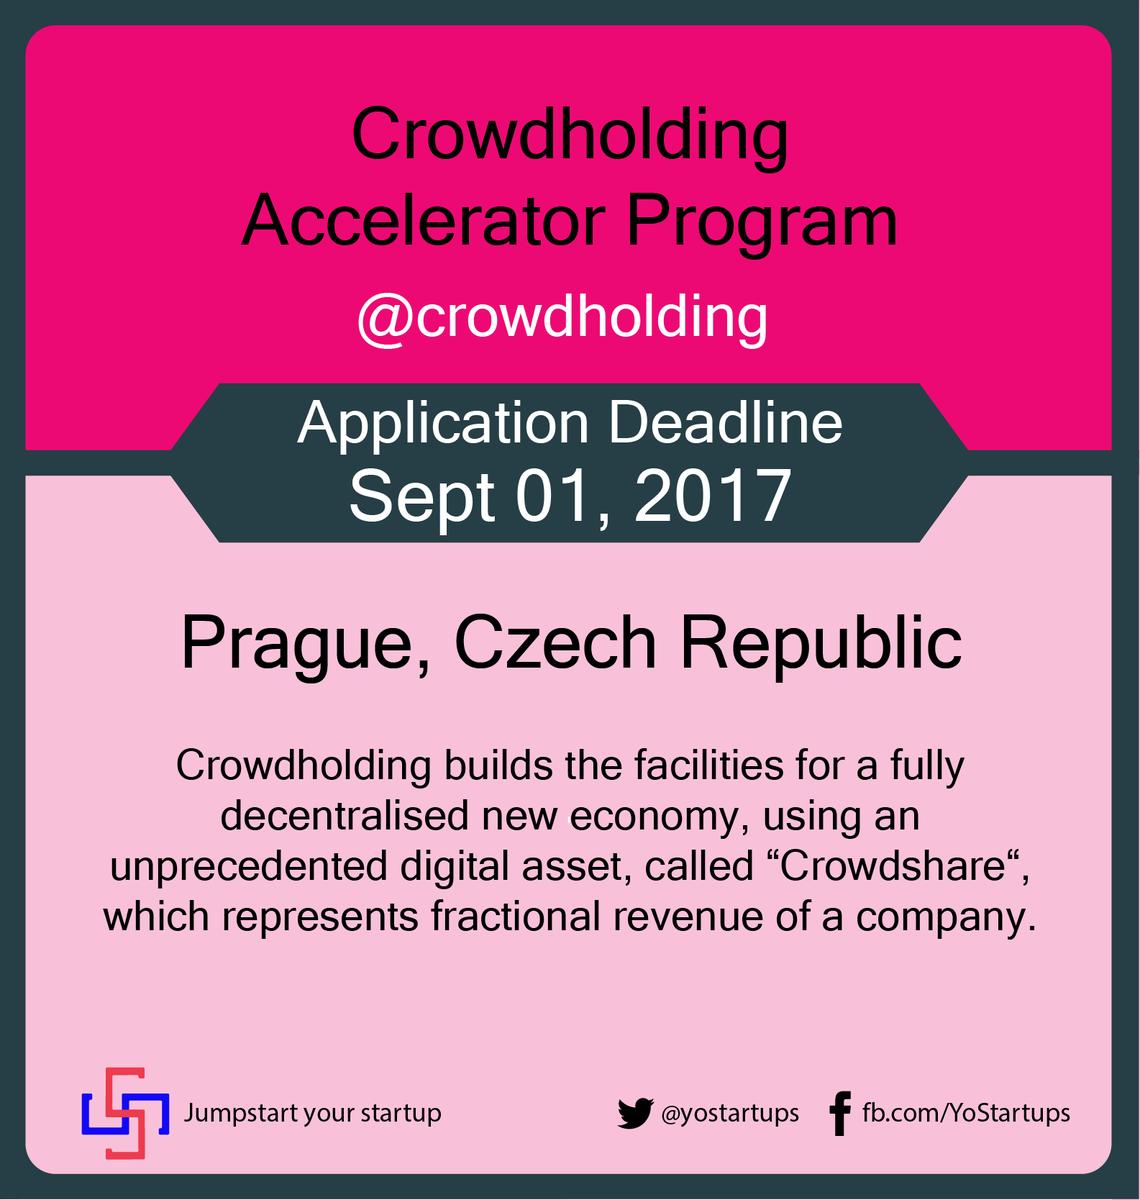 Checkout @crowdholding #accelerator program providing co-creation platform for better collaboration #yostartups  https:// goo.gl/QAXWM5  &nbsp;  <br>http://pic.twitter.com/dGD32duRH6